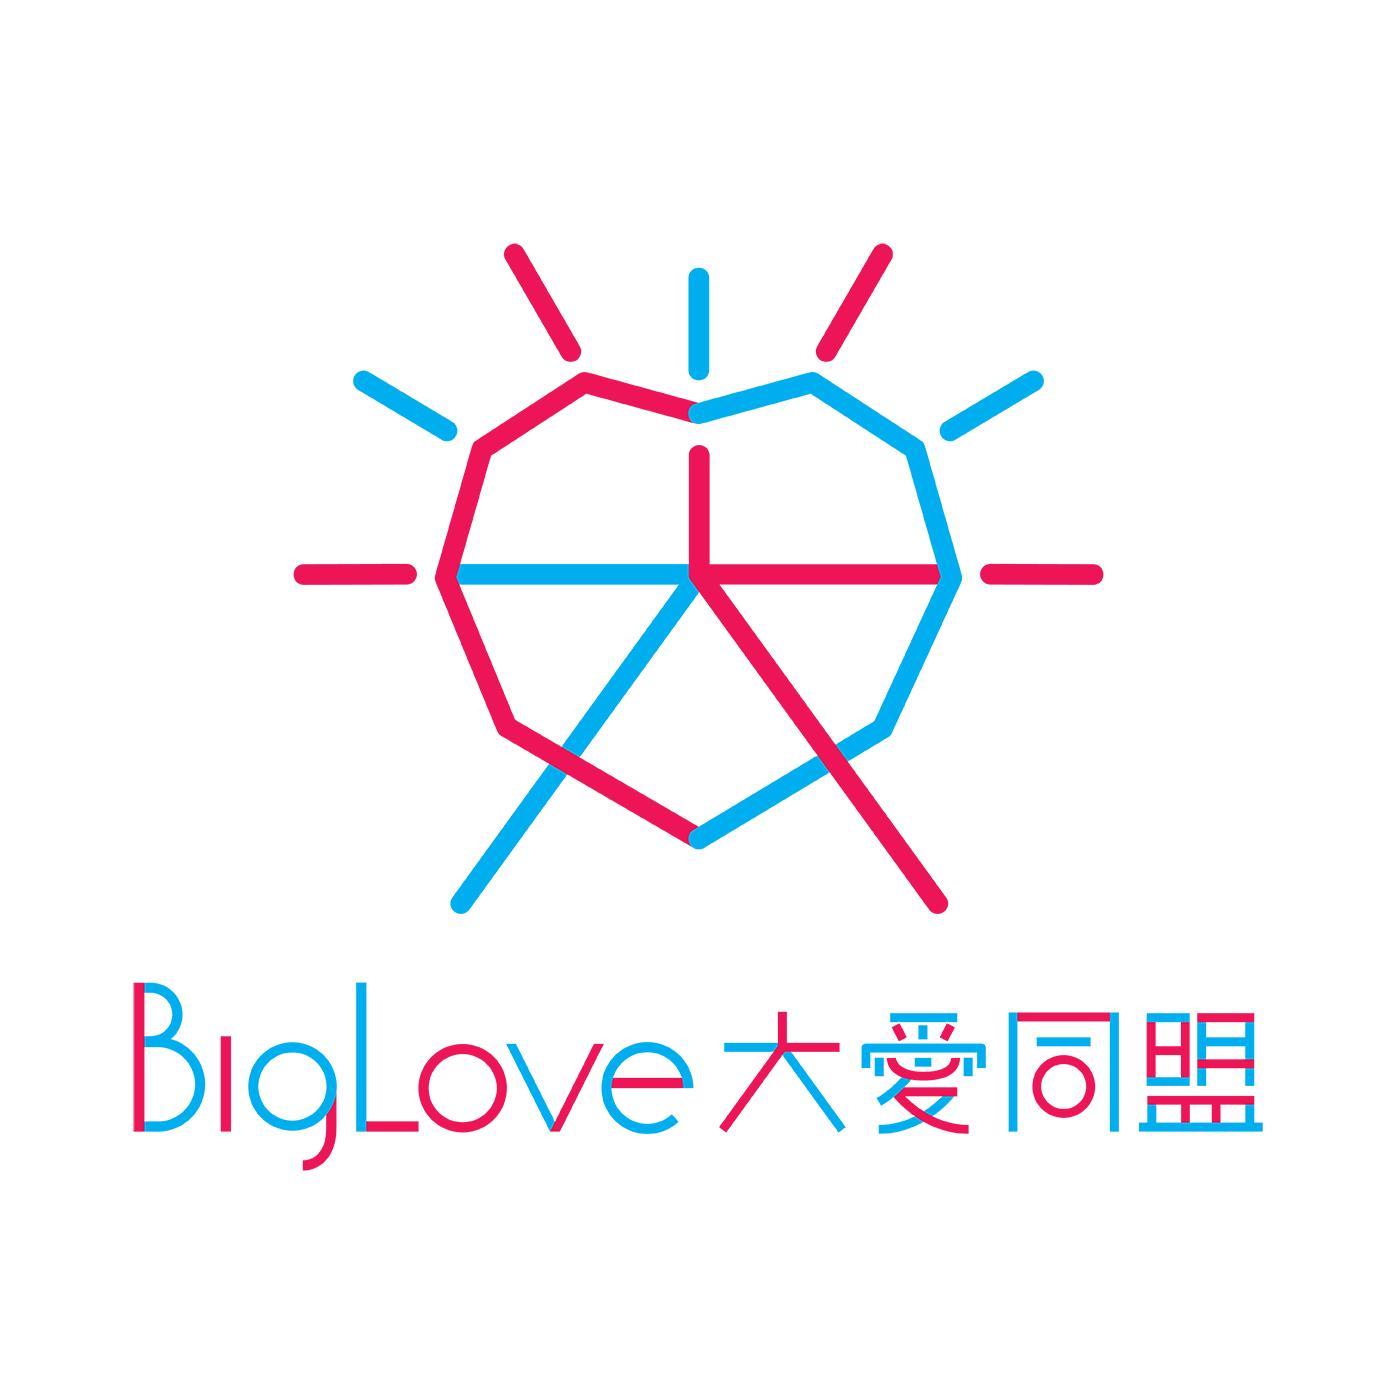 <![CDATA[大爱同盟 BigLove Alliance]]>